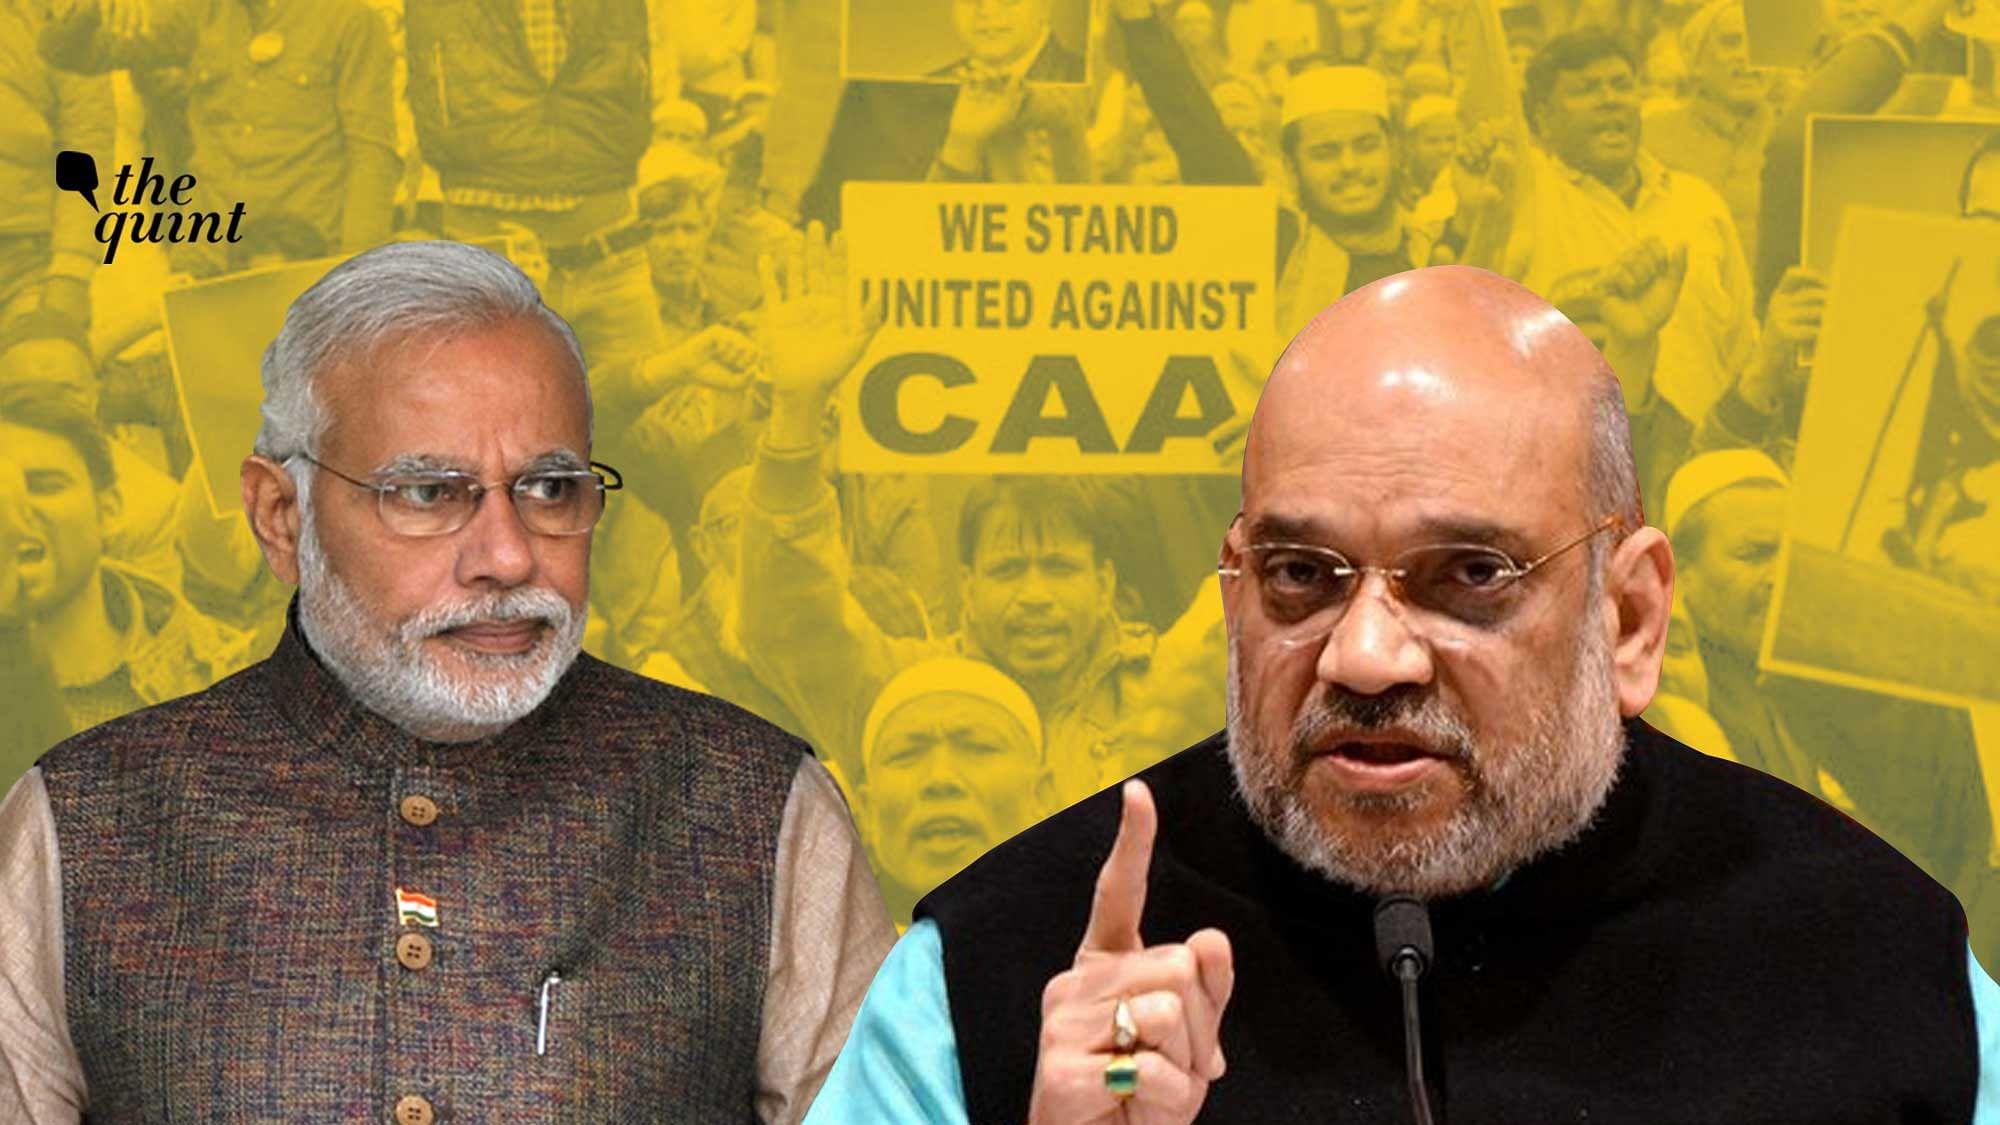 Chronology Samjhiye – Why You Should Believe Shah Over Modi on CAA